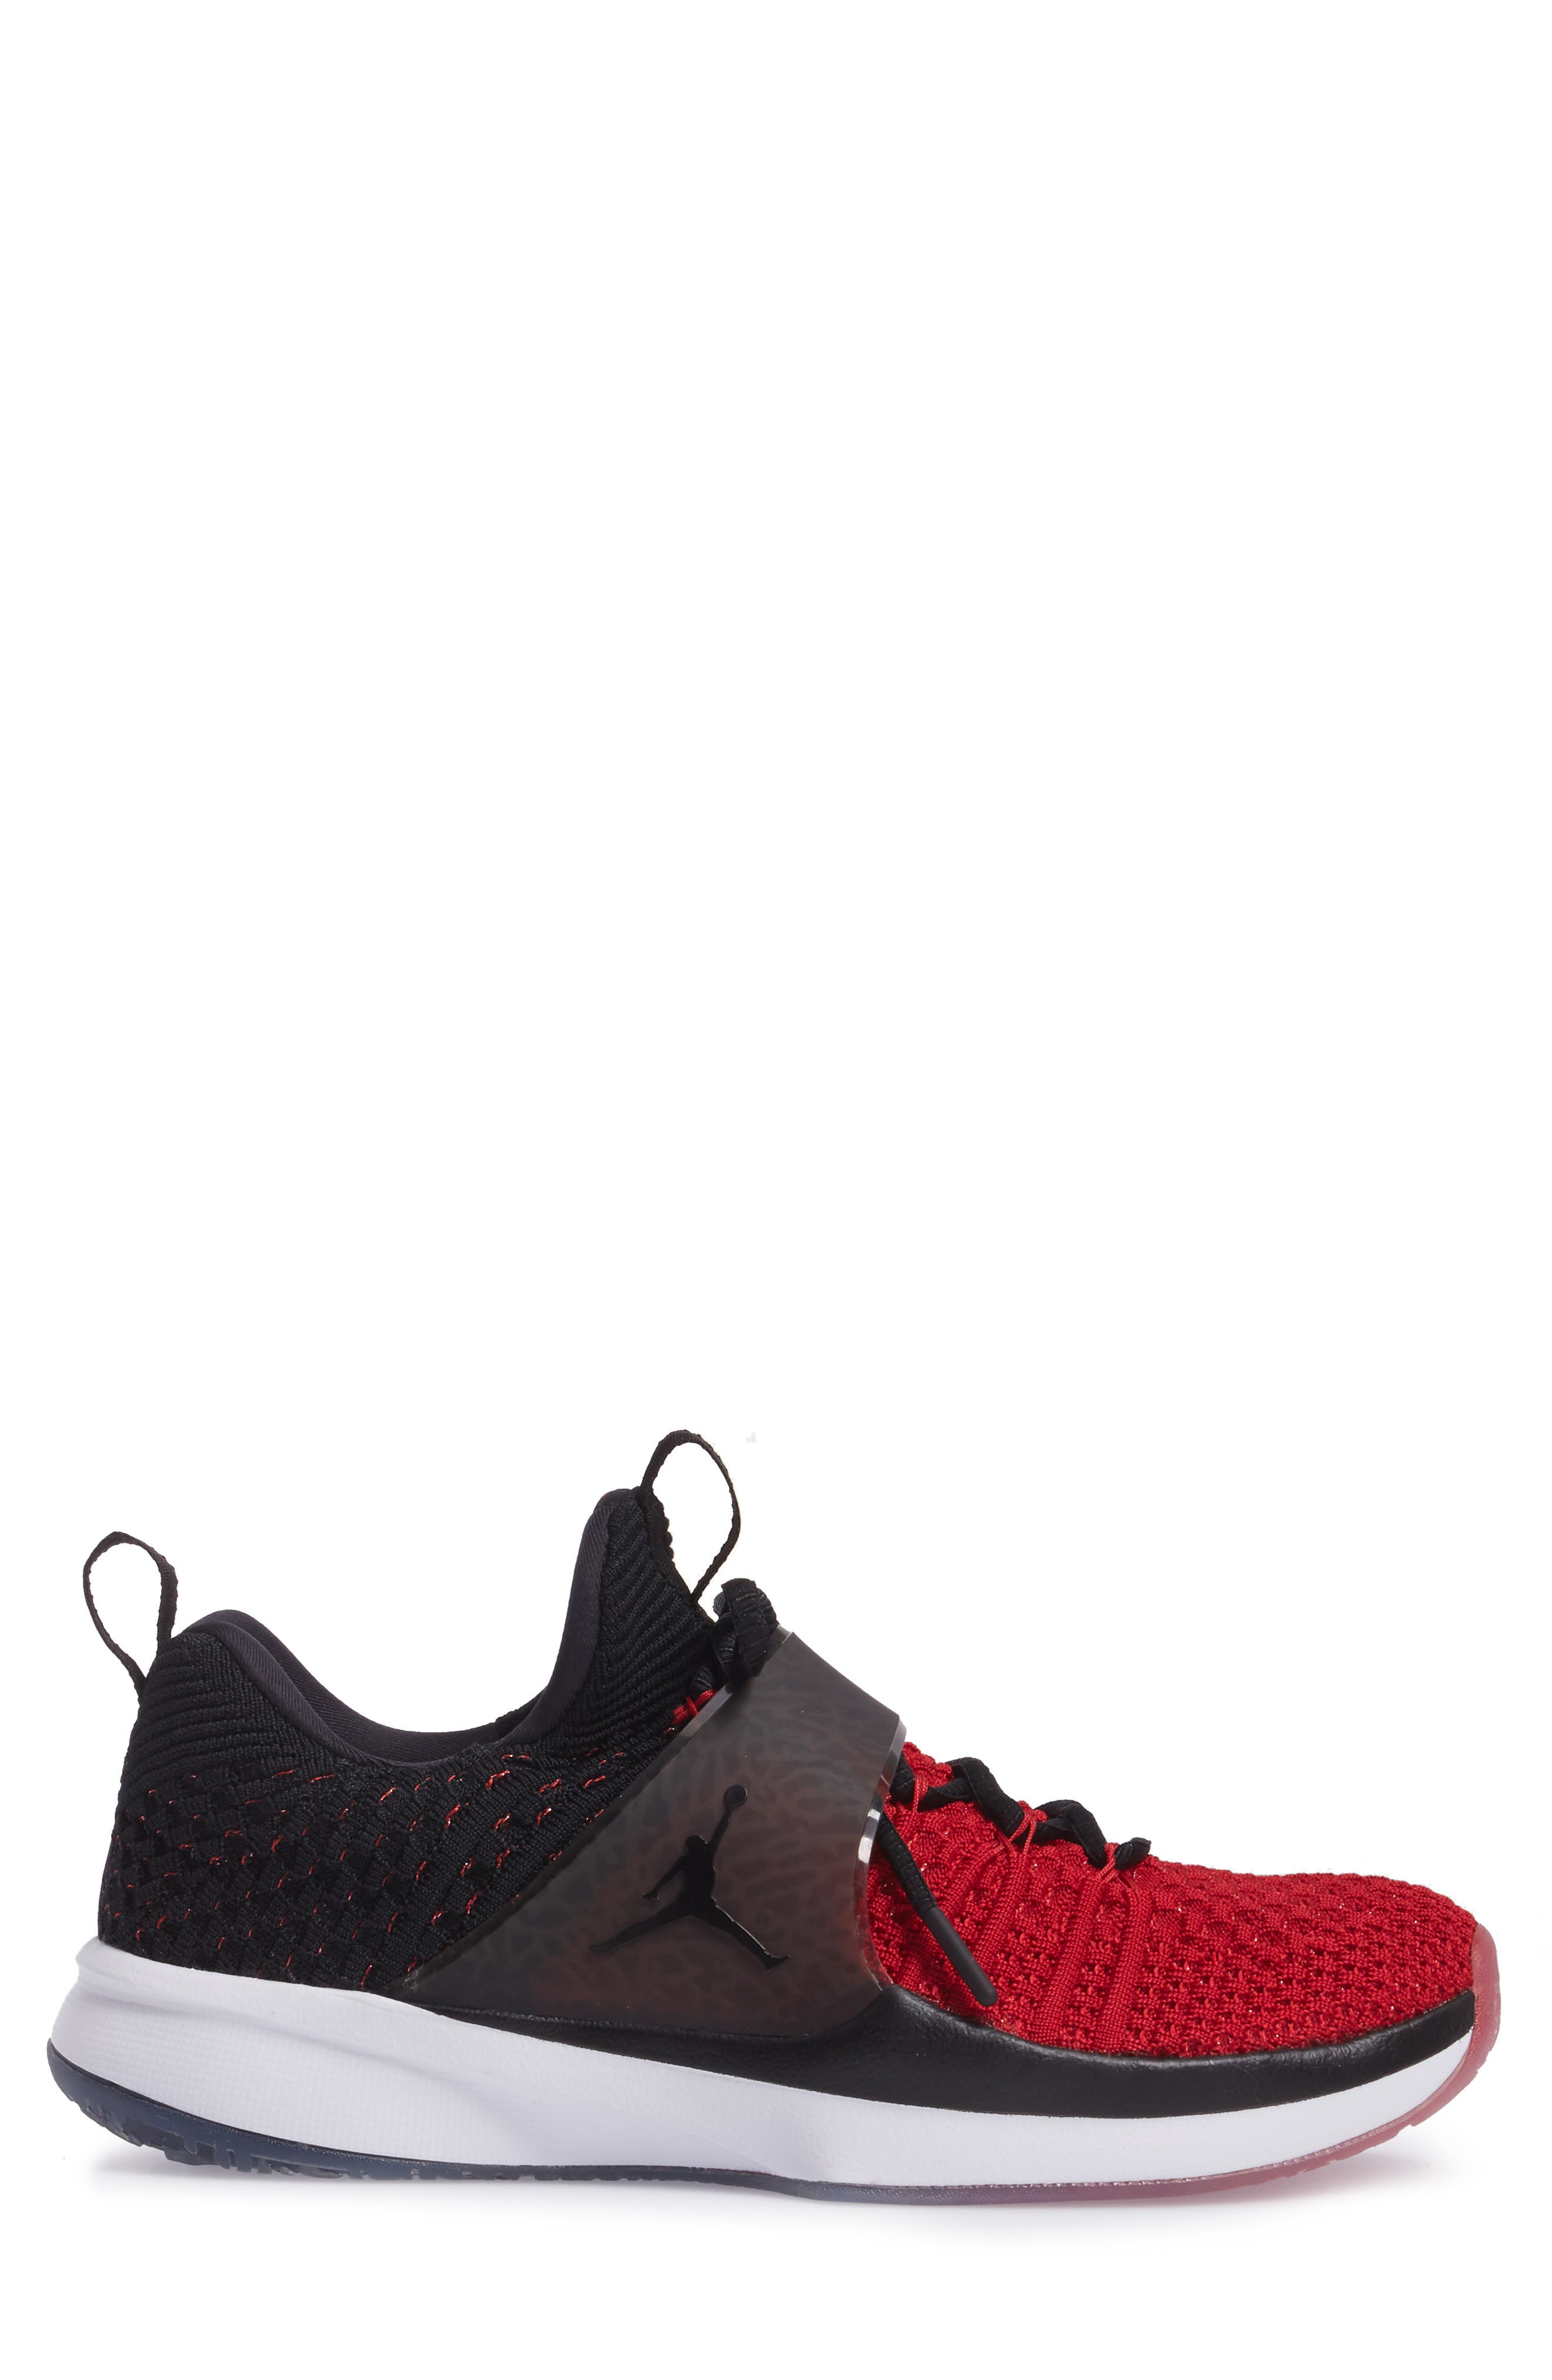 Jordan Flyknit Trainer 2 Low Sneaker,                             Alternate thumbnail 15, color,